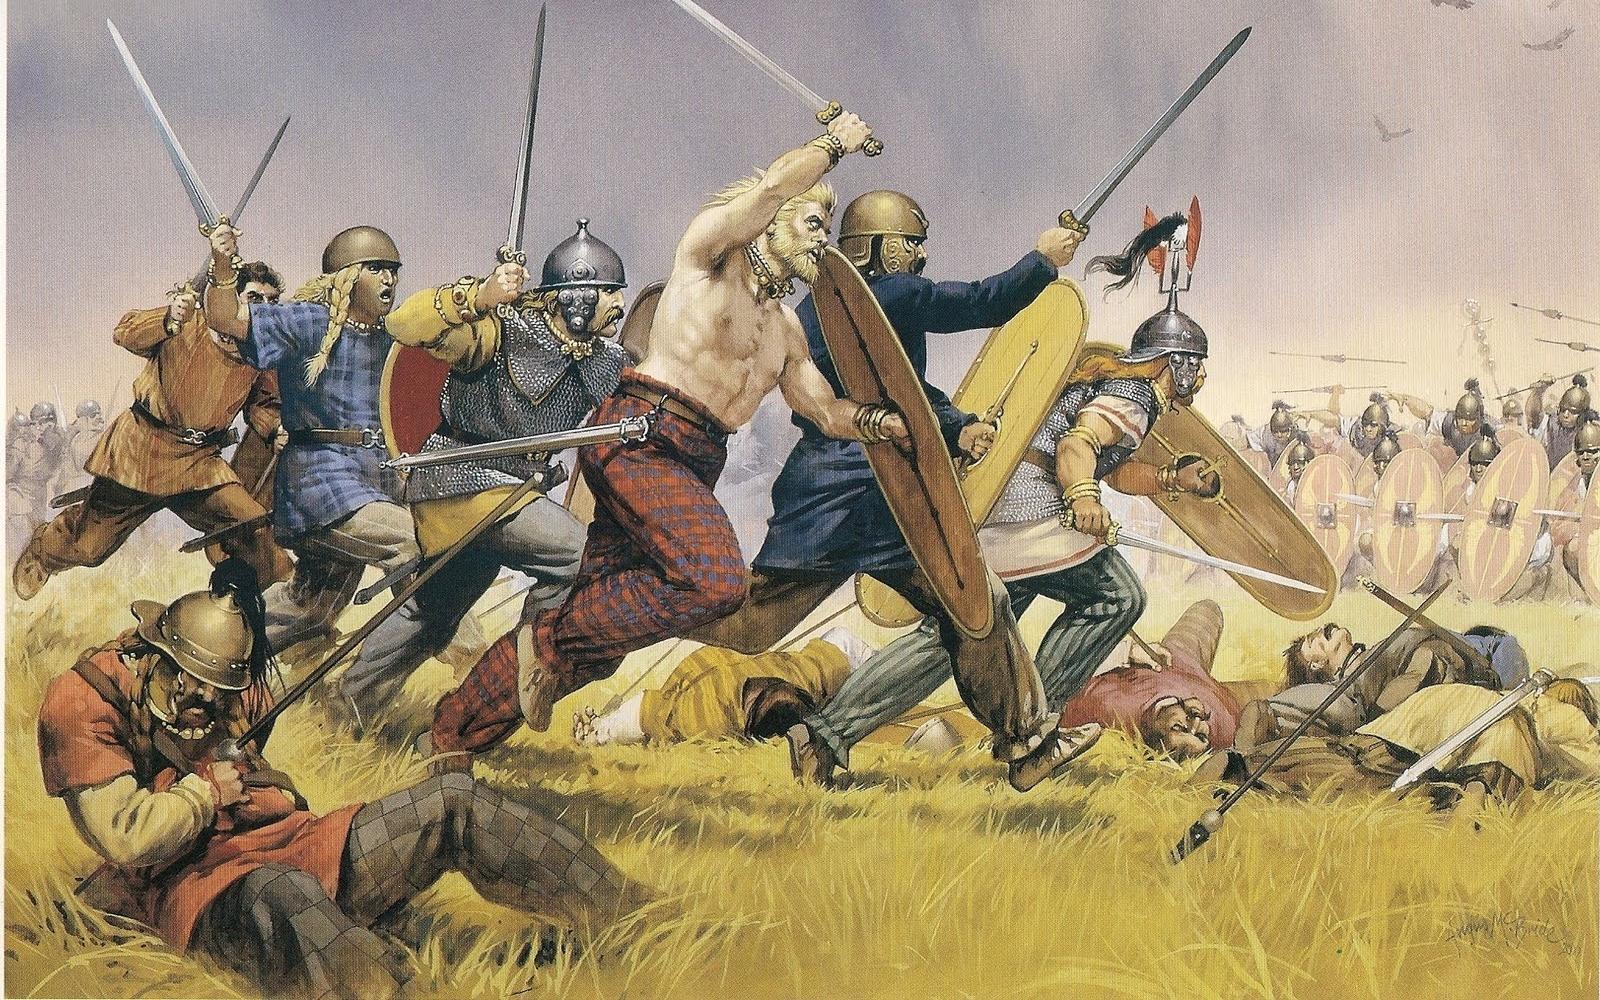 Celtic Warrior Background Artistic - celtic warriors